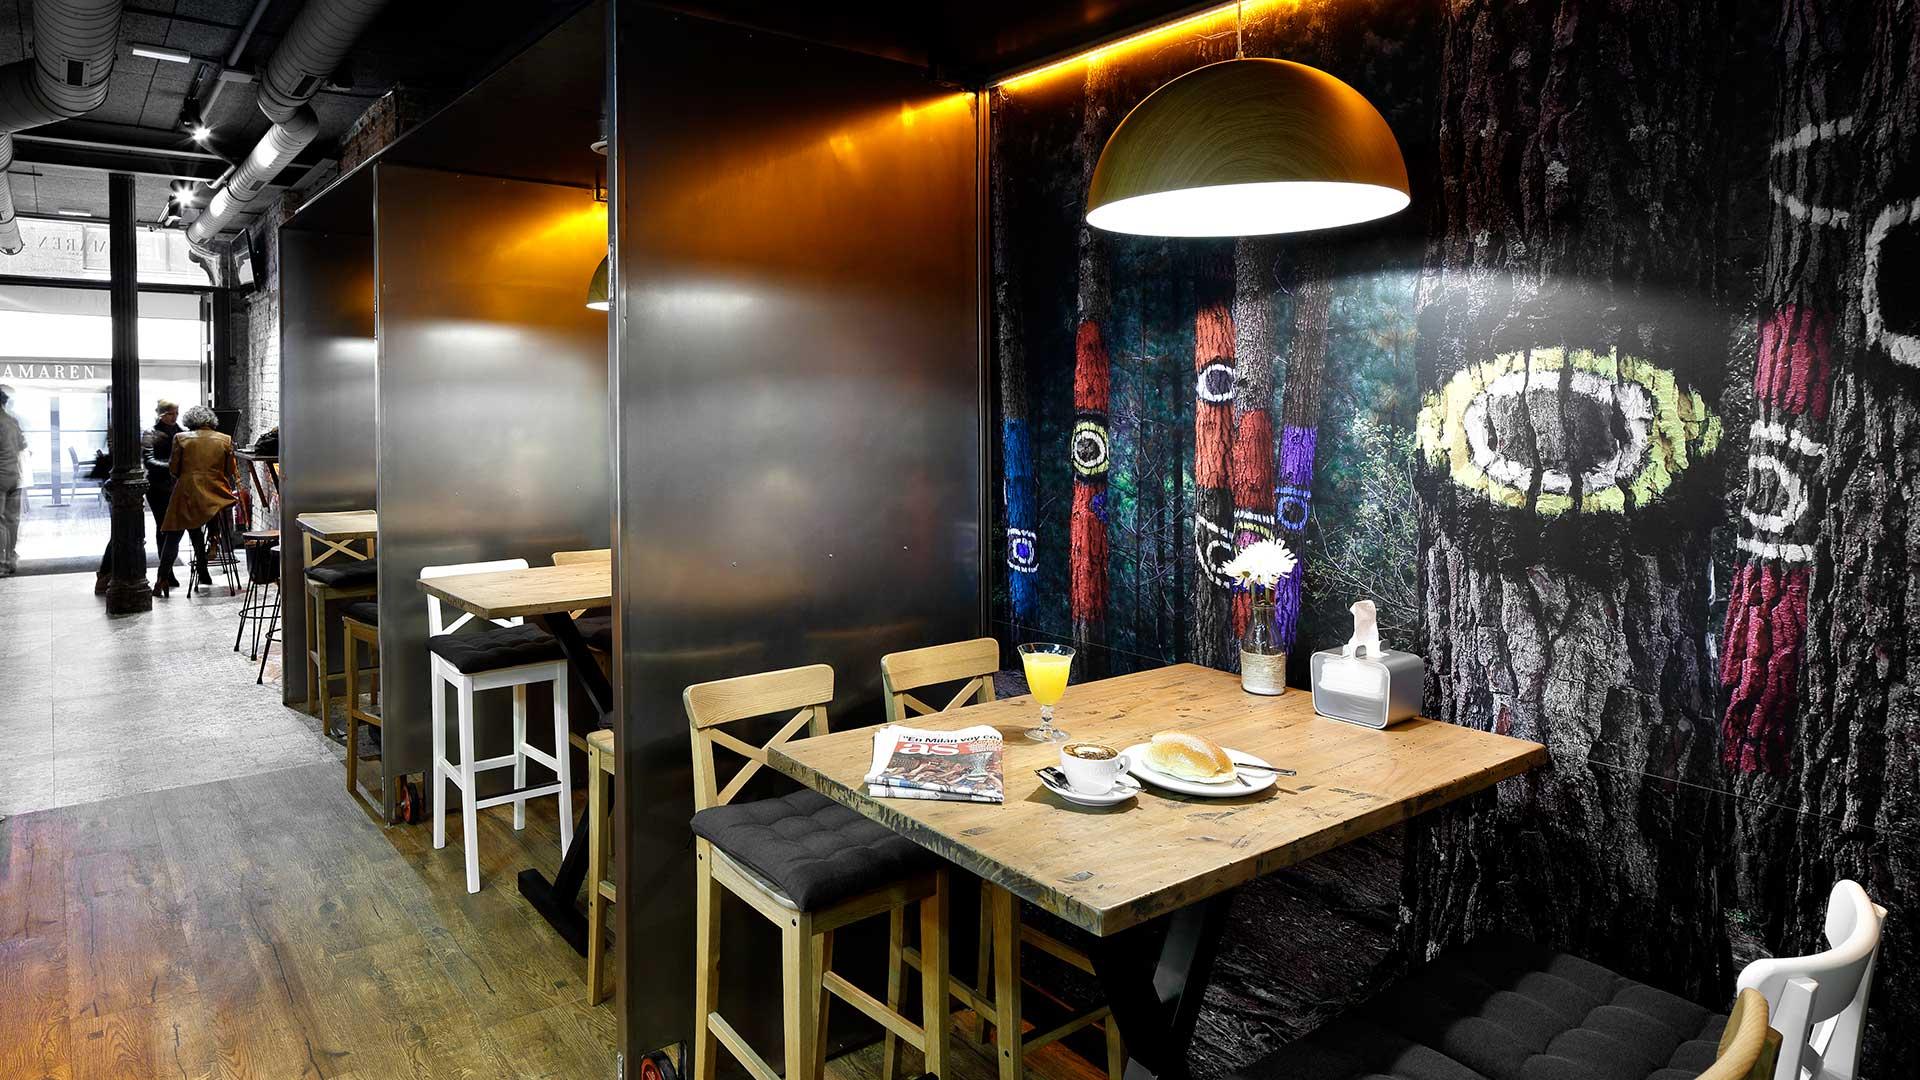 Soft restaurant ideas para decoraci n de tu restaurante for Ideas decoracion restaurante